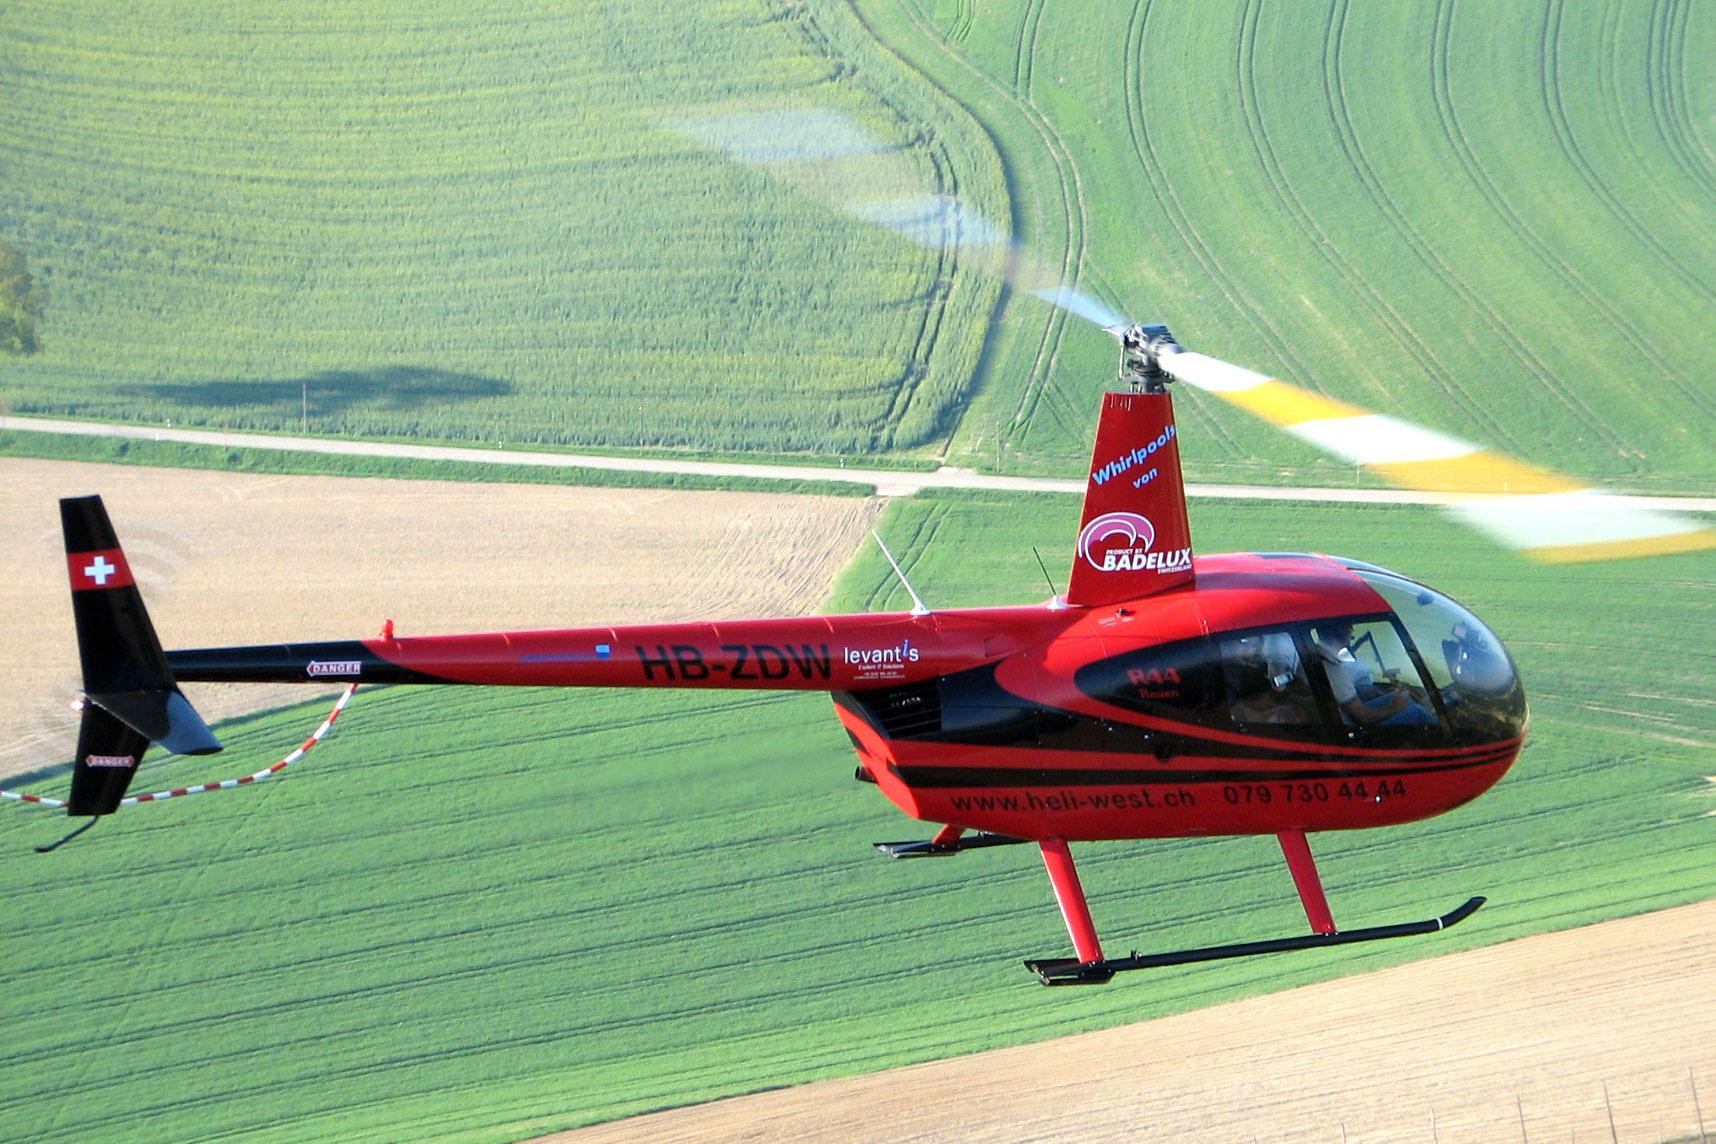 Hubschrauberflug Ganderkes